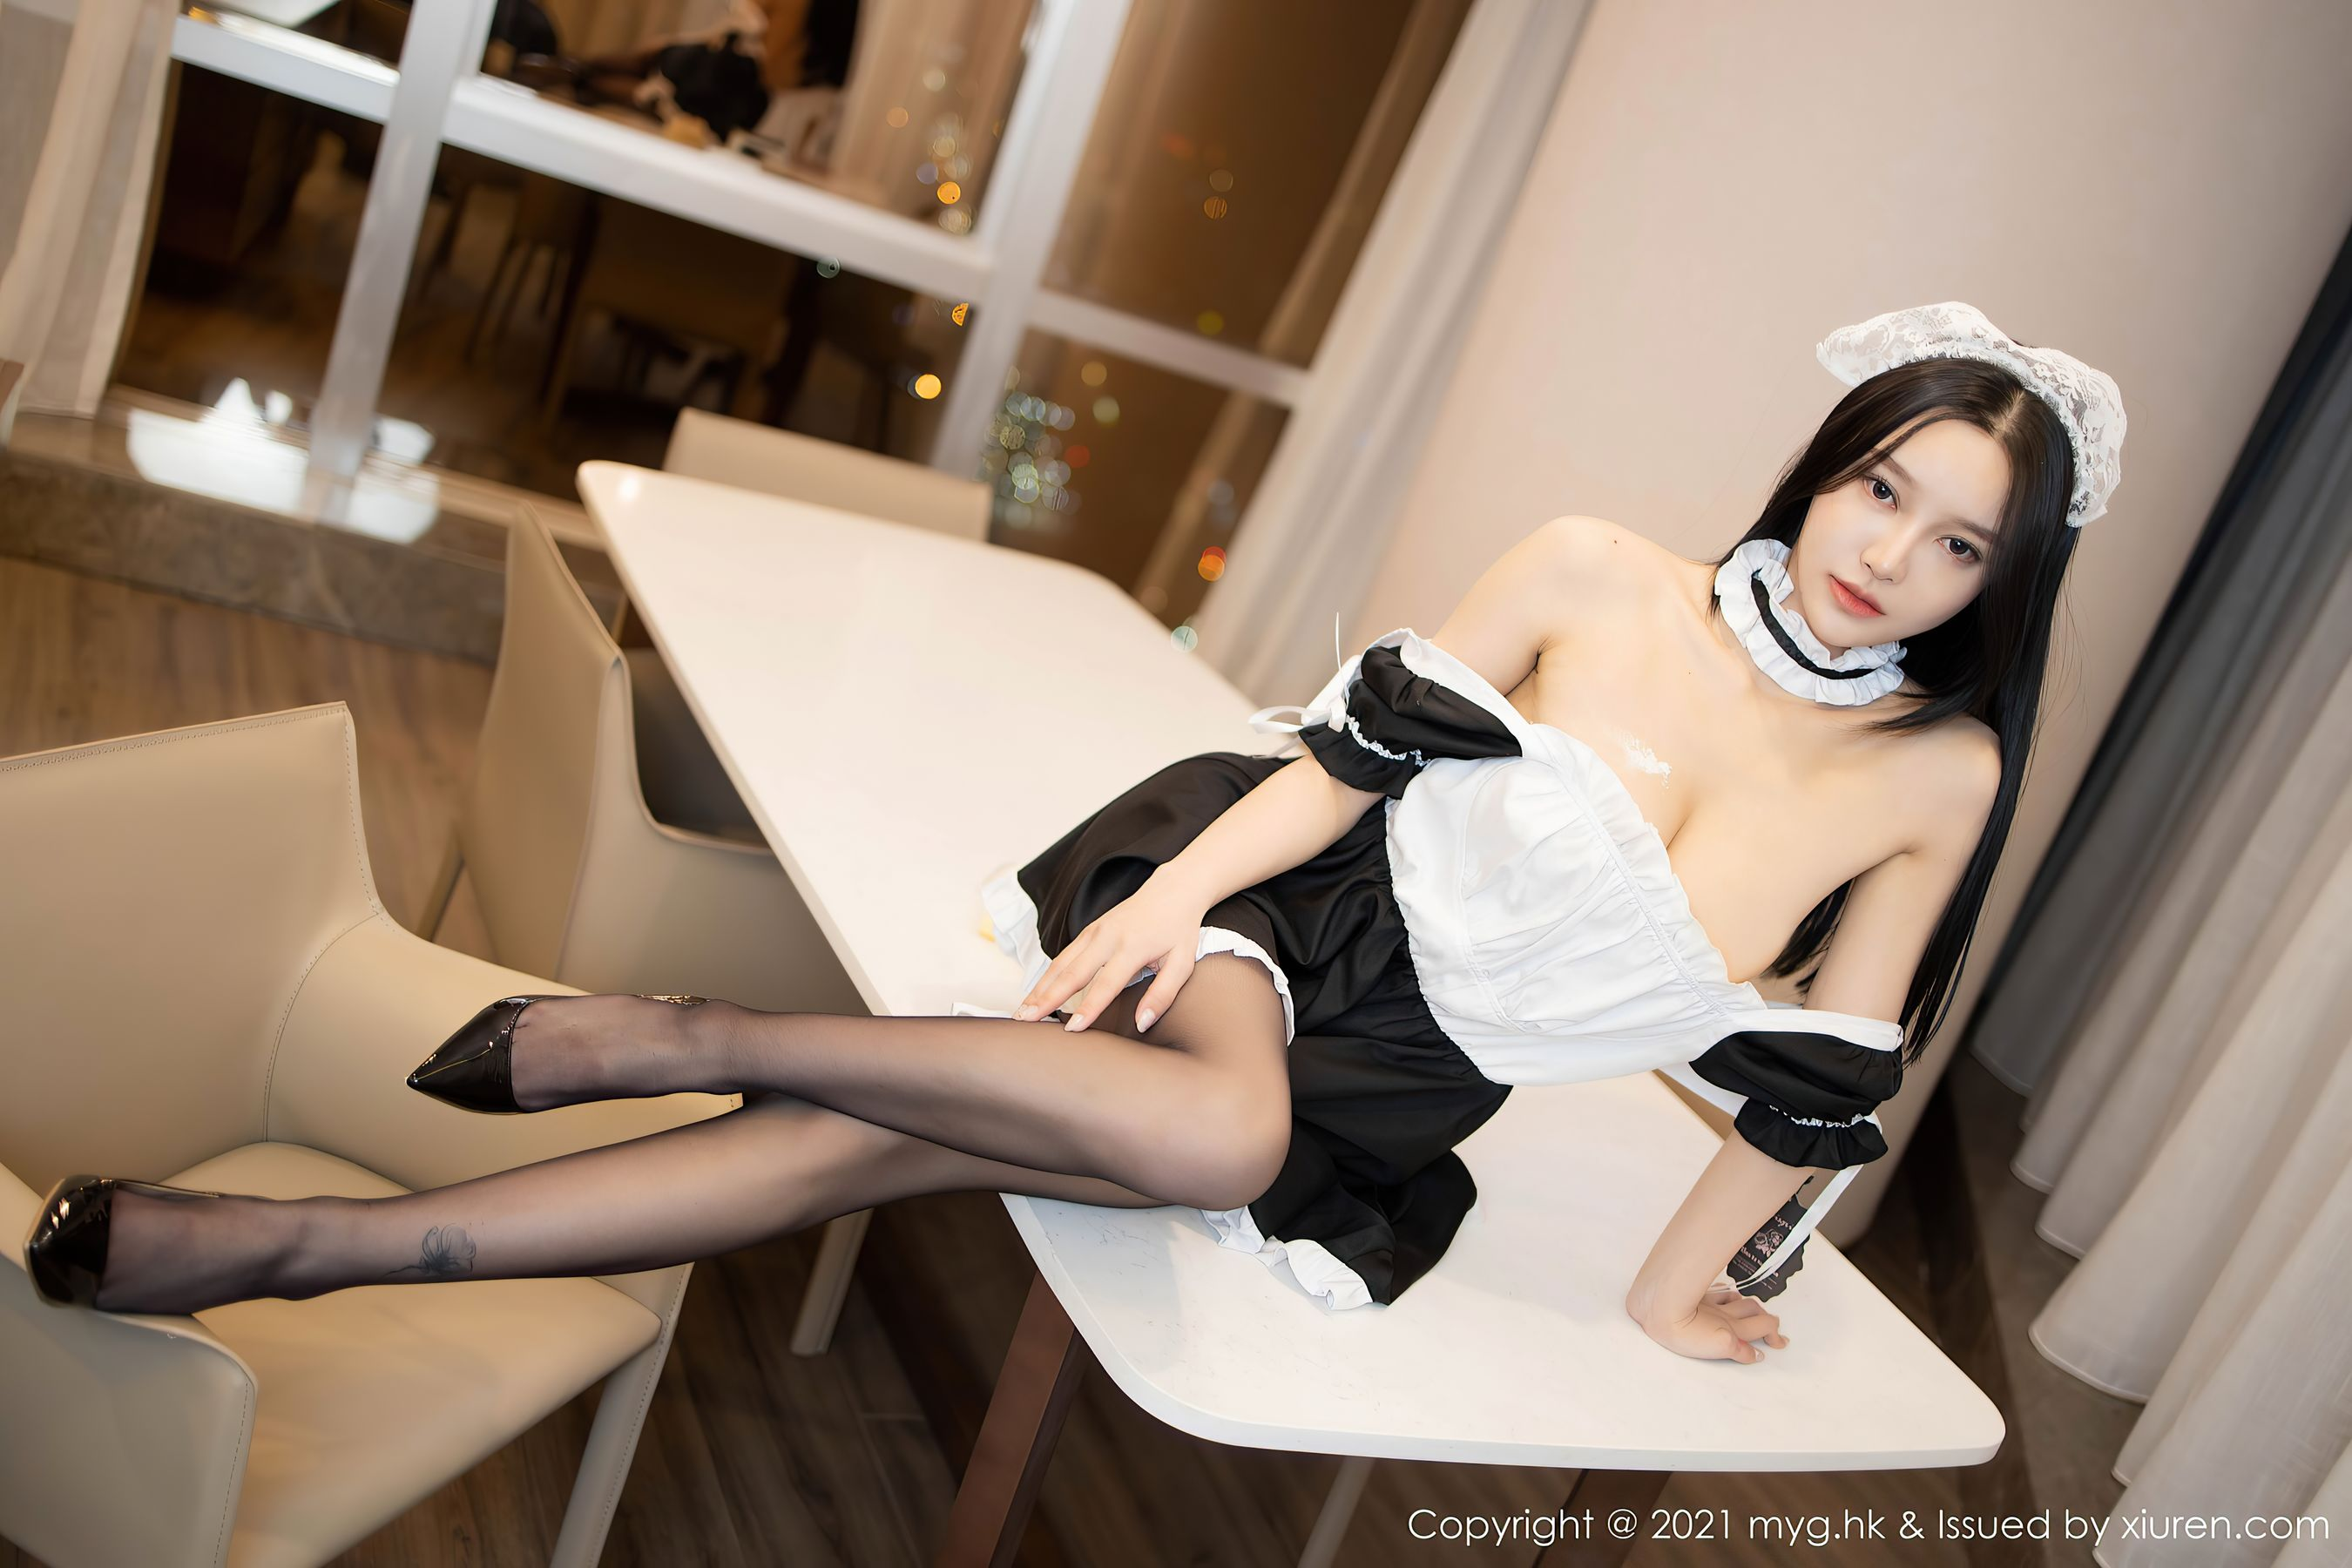 VOL.729 [美媛馆]女仆黑丝制服:唐琪儿(王艳卓,唐琪儿il)超高清写真套图(54P)